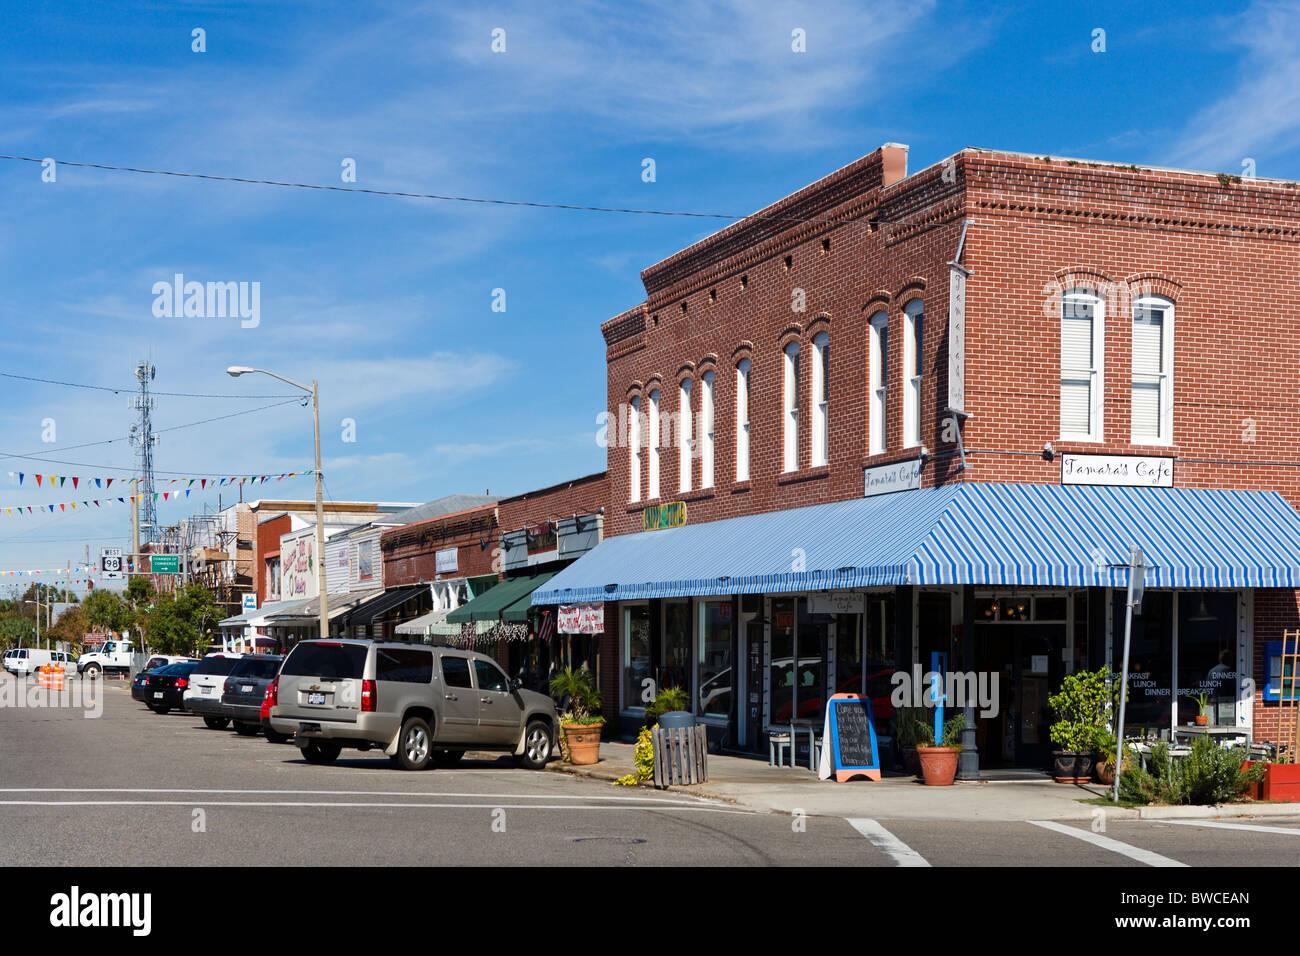 Market Street in downtown Apalachicola, Gulf Coast, Florida, USA - Stock Image